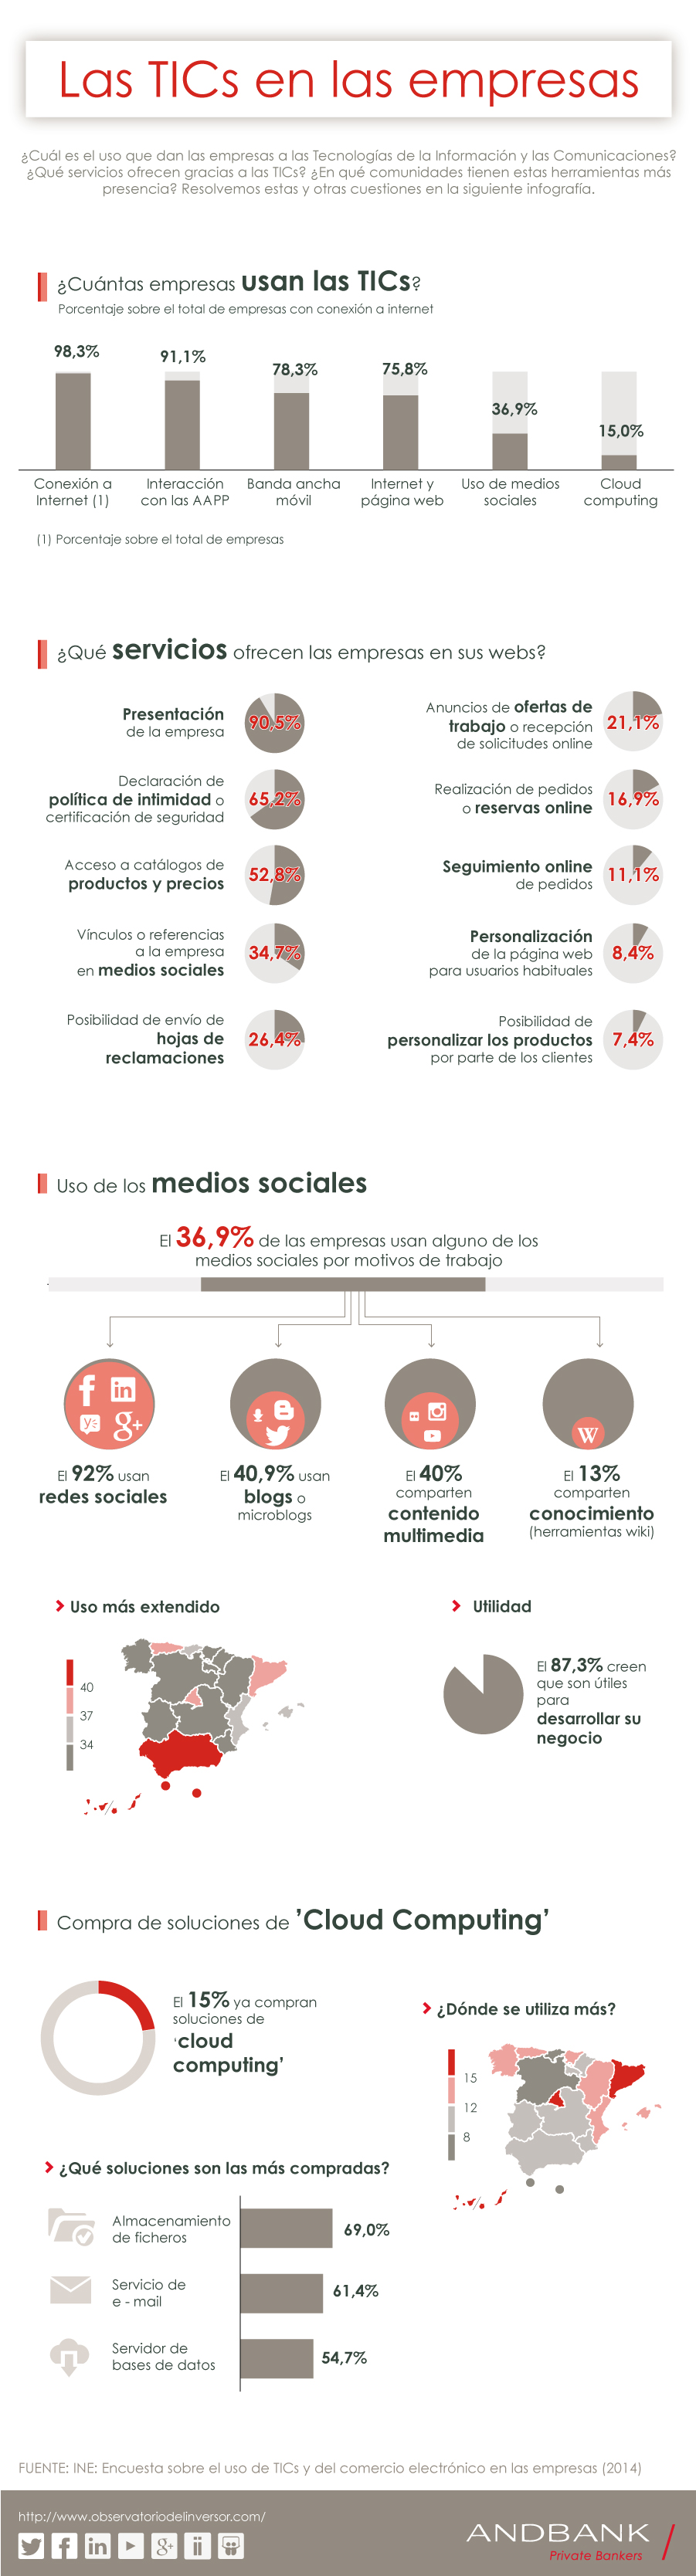 Andbank infografía TICs